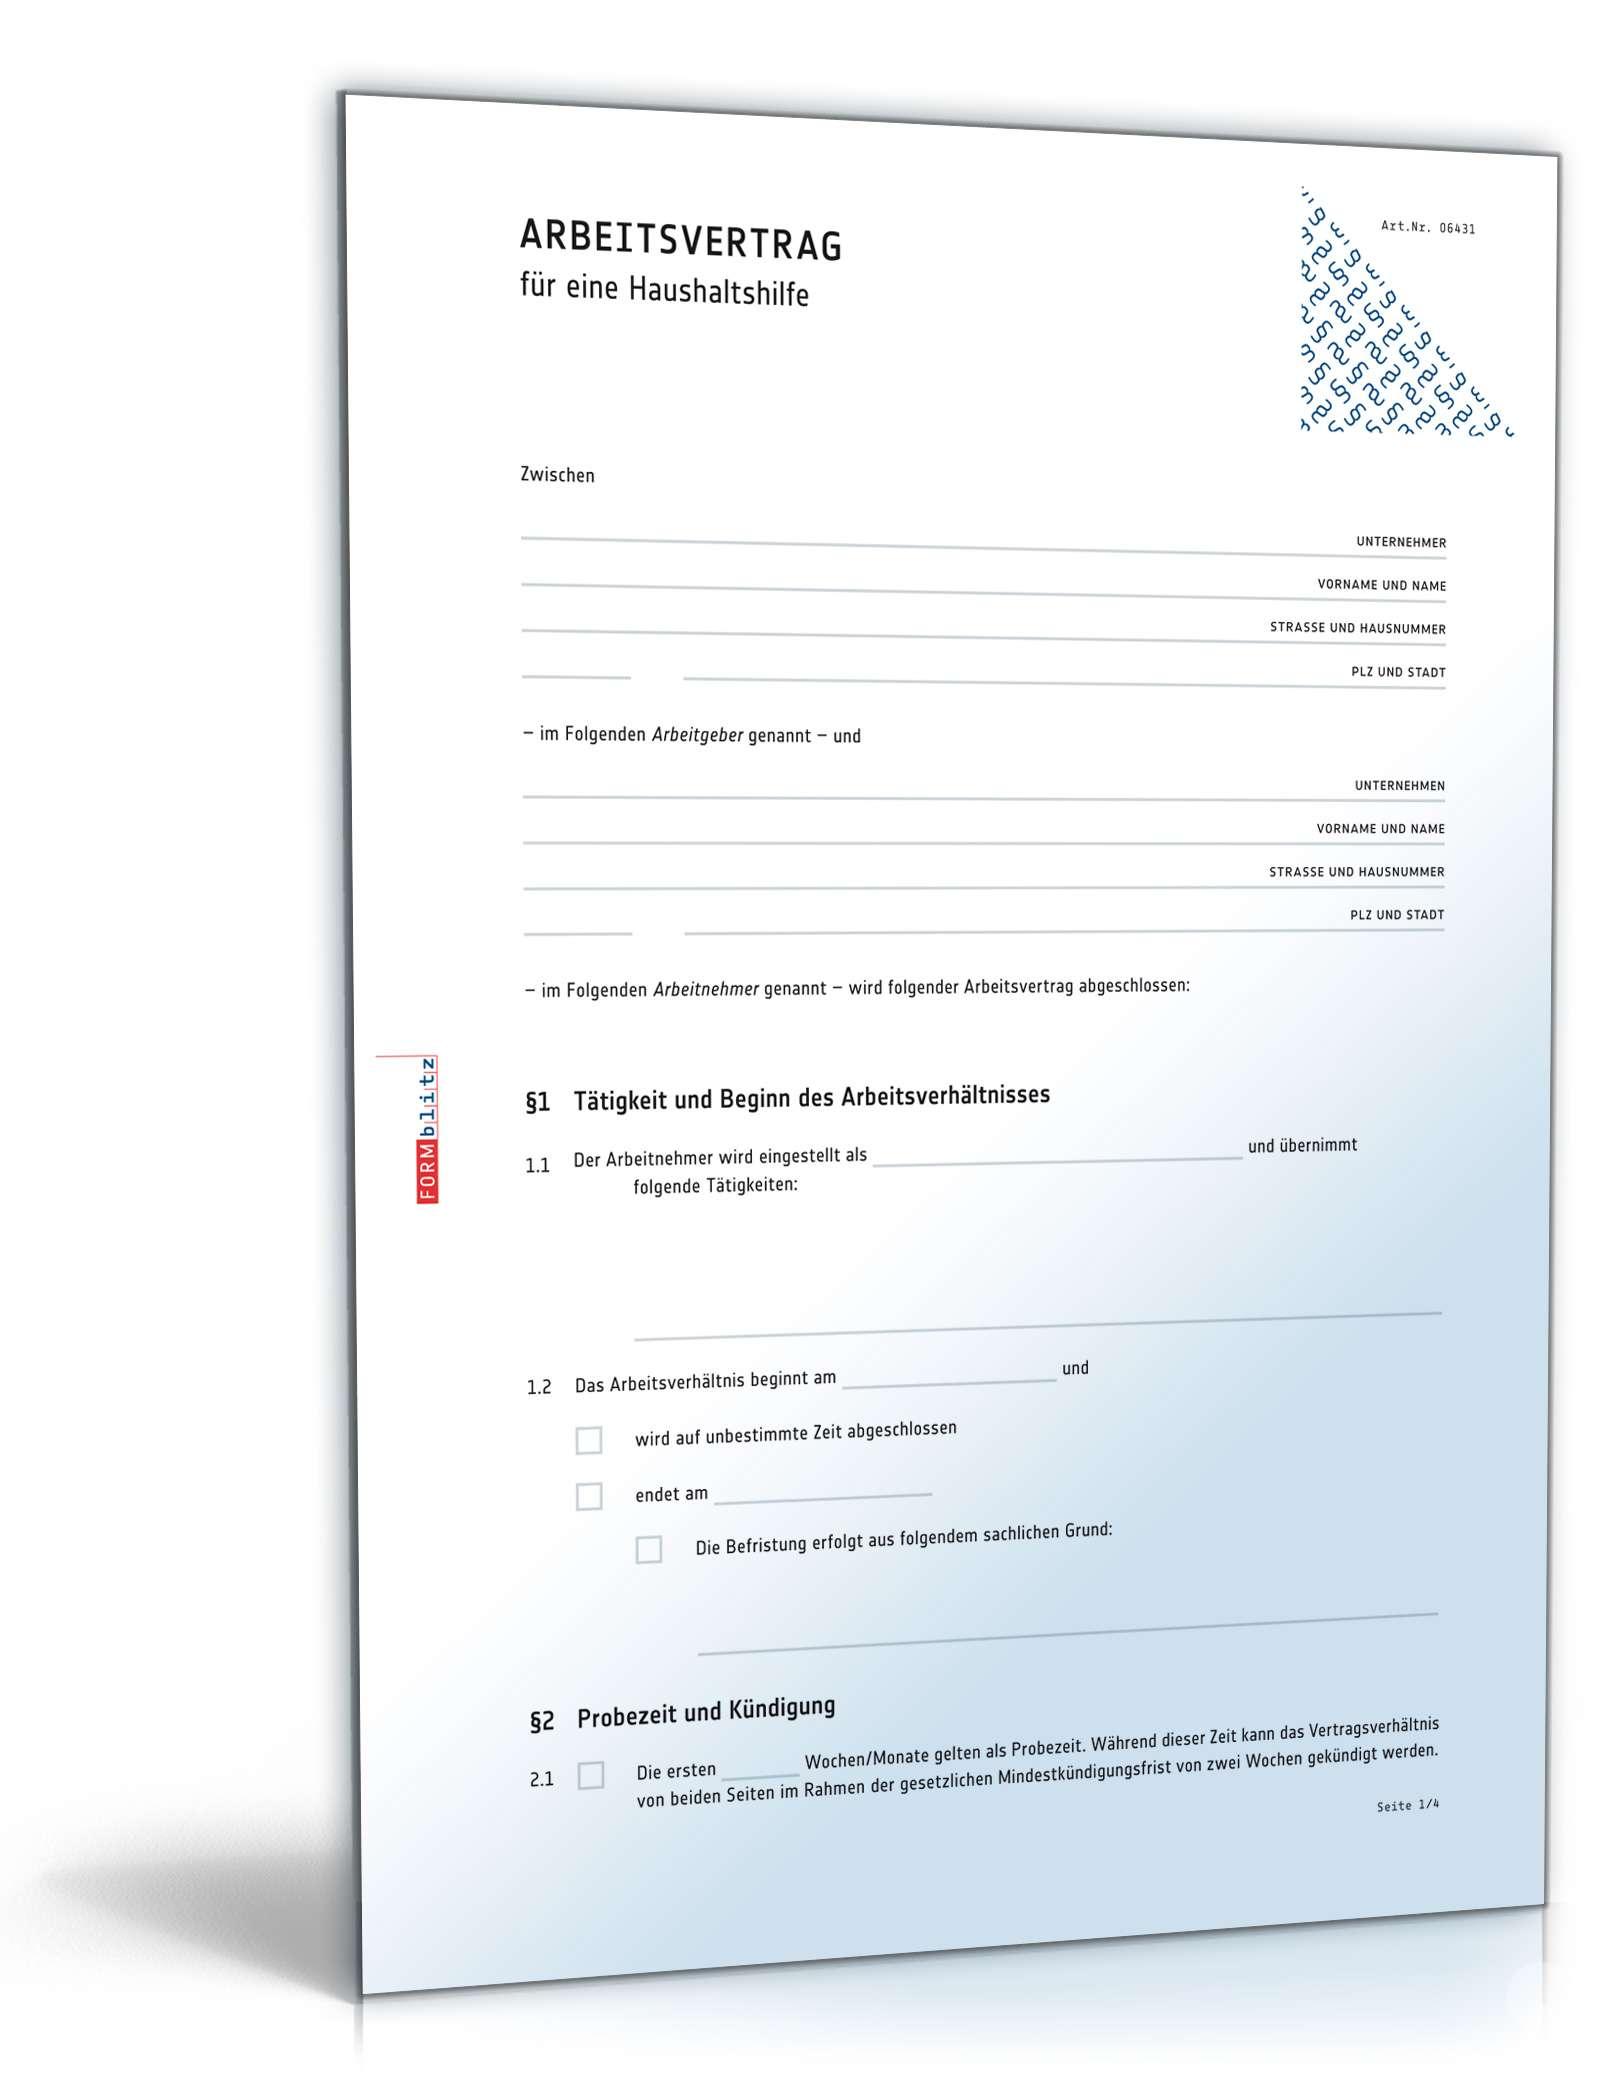 arbeitsvertrag haushaltshilfe muster zum download - Arbeitsvertrage Muster